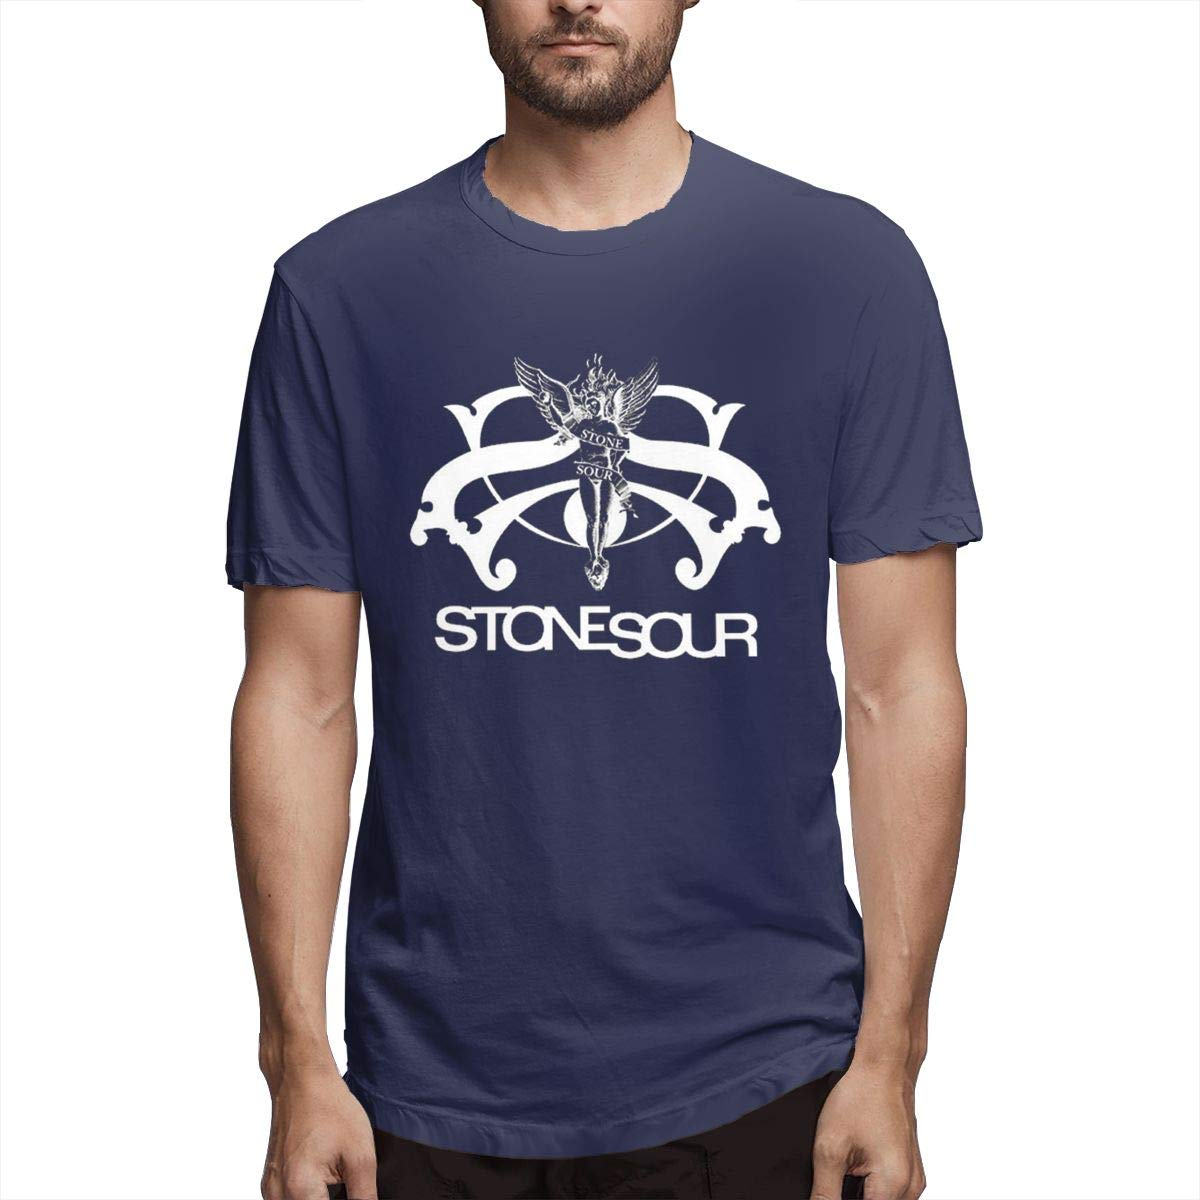 Terstin Stone Sour Classic Retro Vintage Shirts